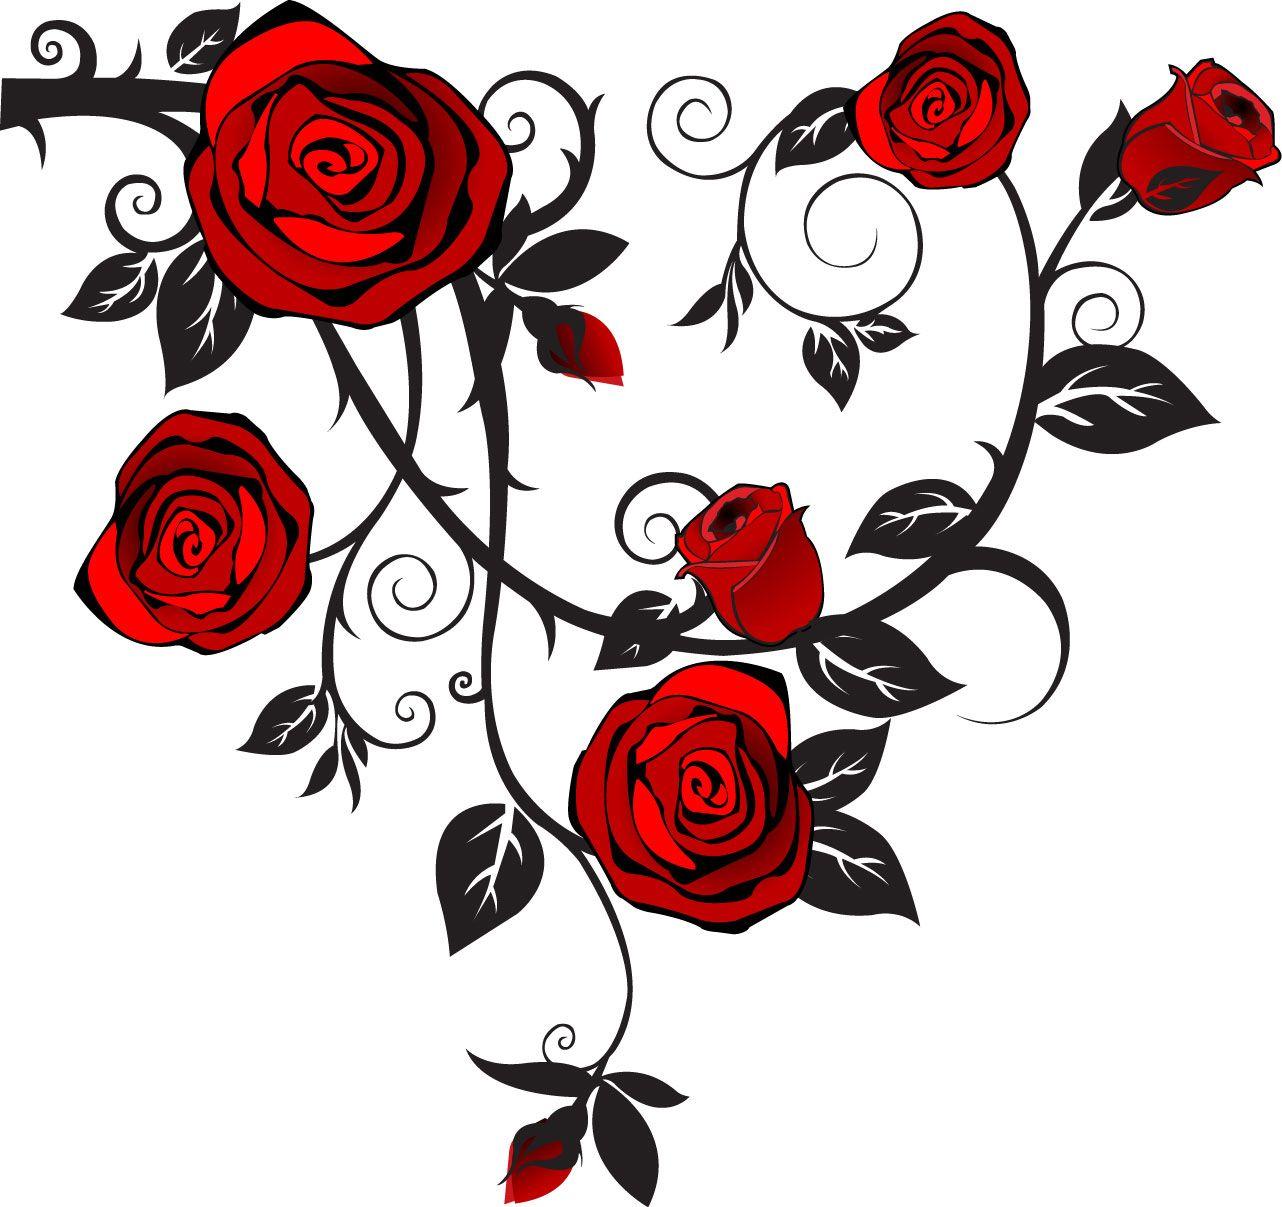 Rose Image Vector Clip Art Online, Royalty Free & Public